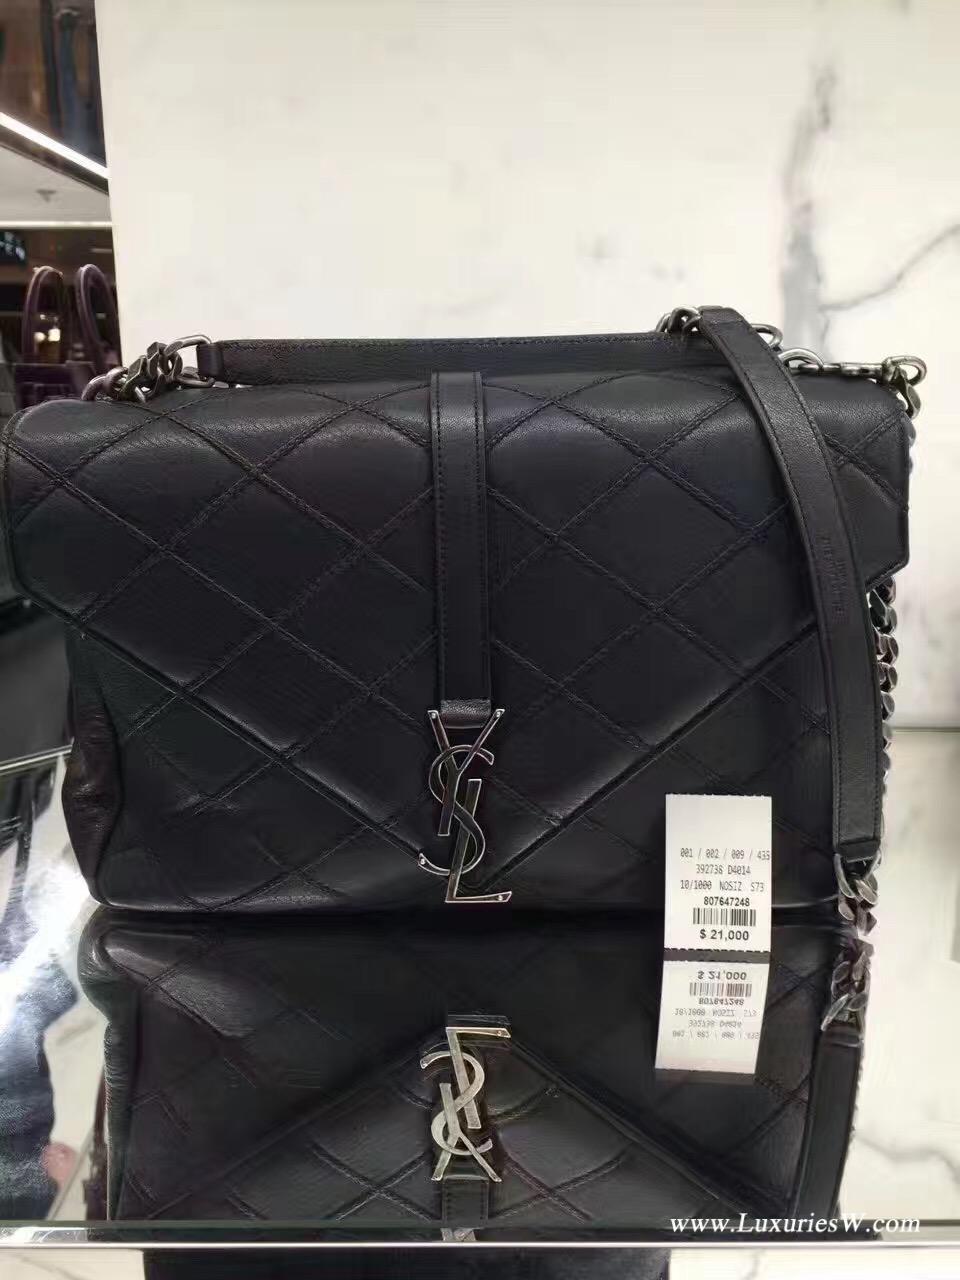 YSL聖羅蘭 經典SAINT LAURENT黑色真皮 金屬鏈手提包